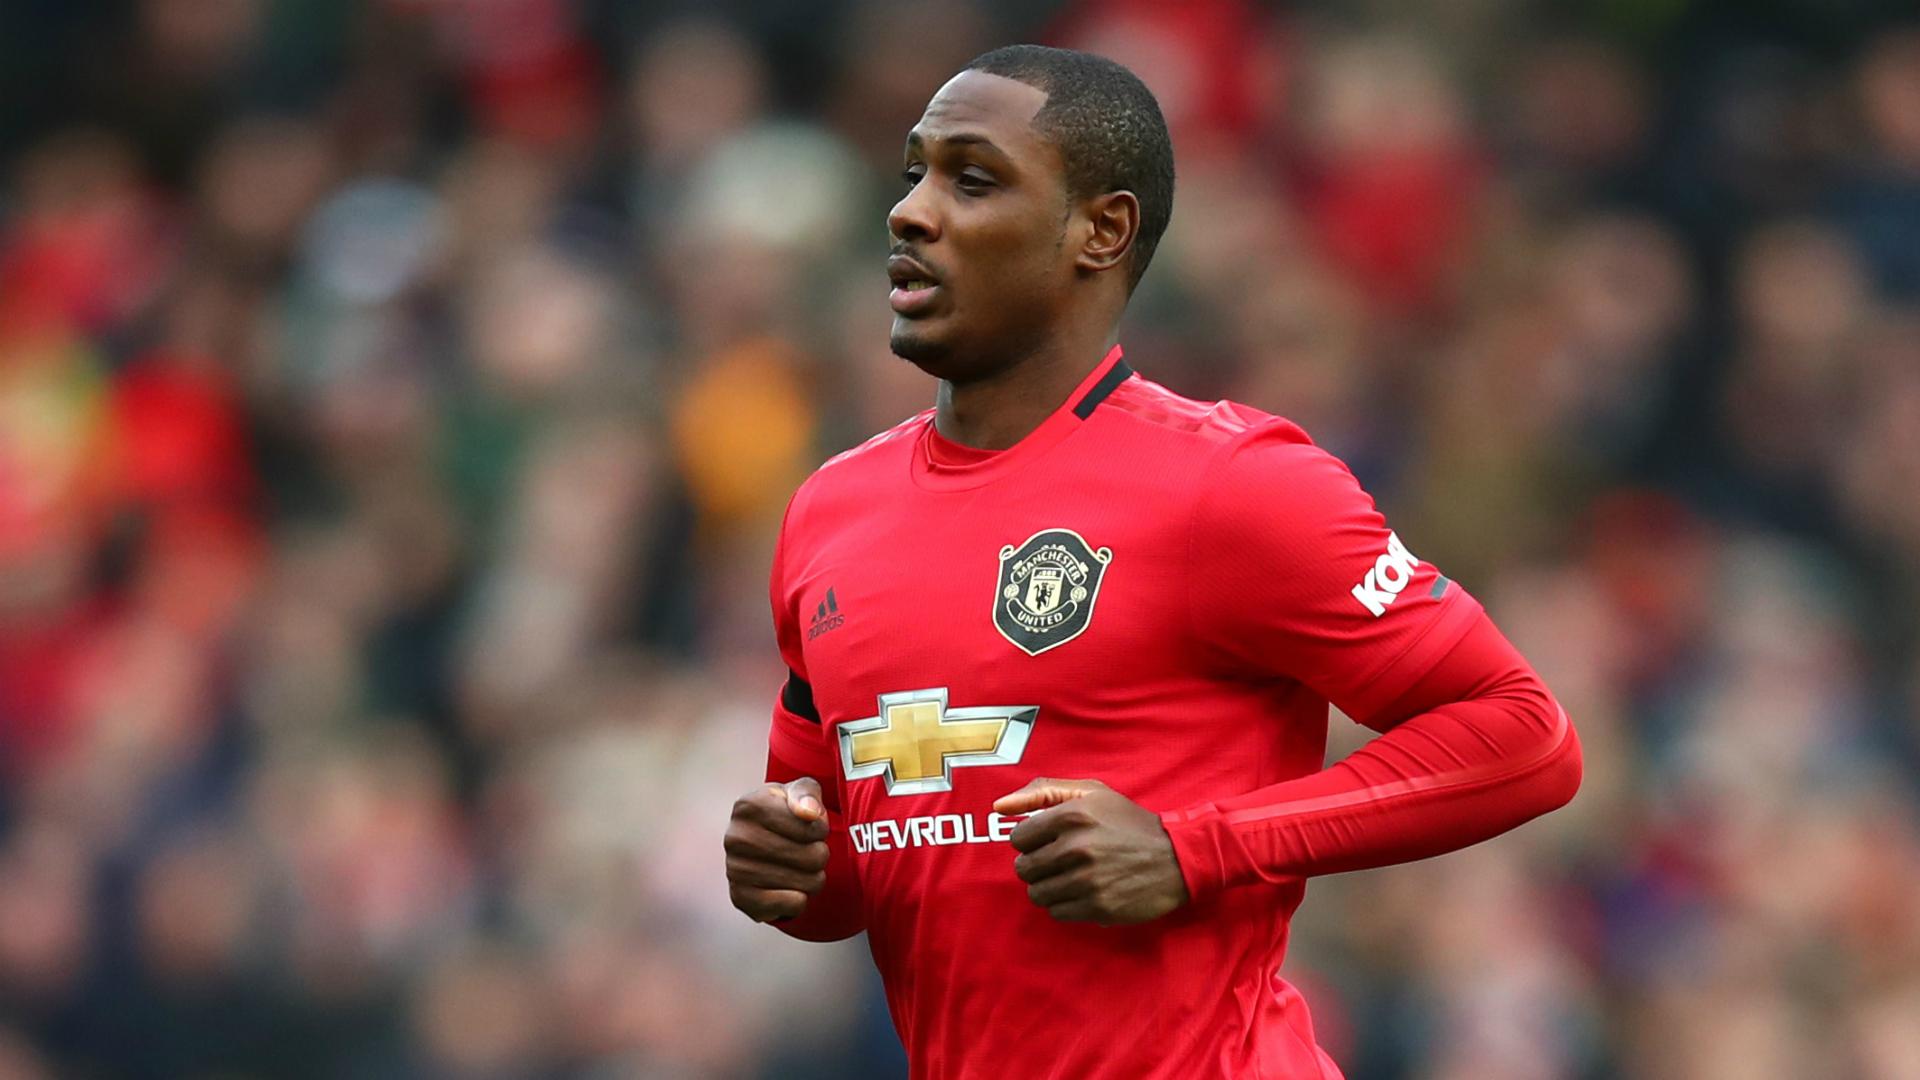 Odion Ighalo: The Opta stats behind striker's impressive start at Man Utd